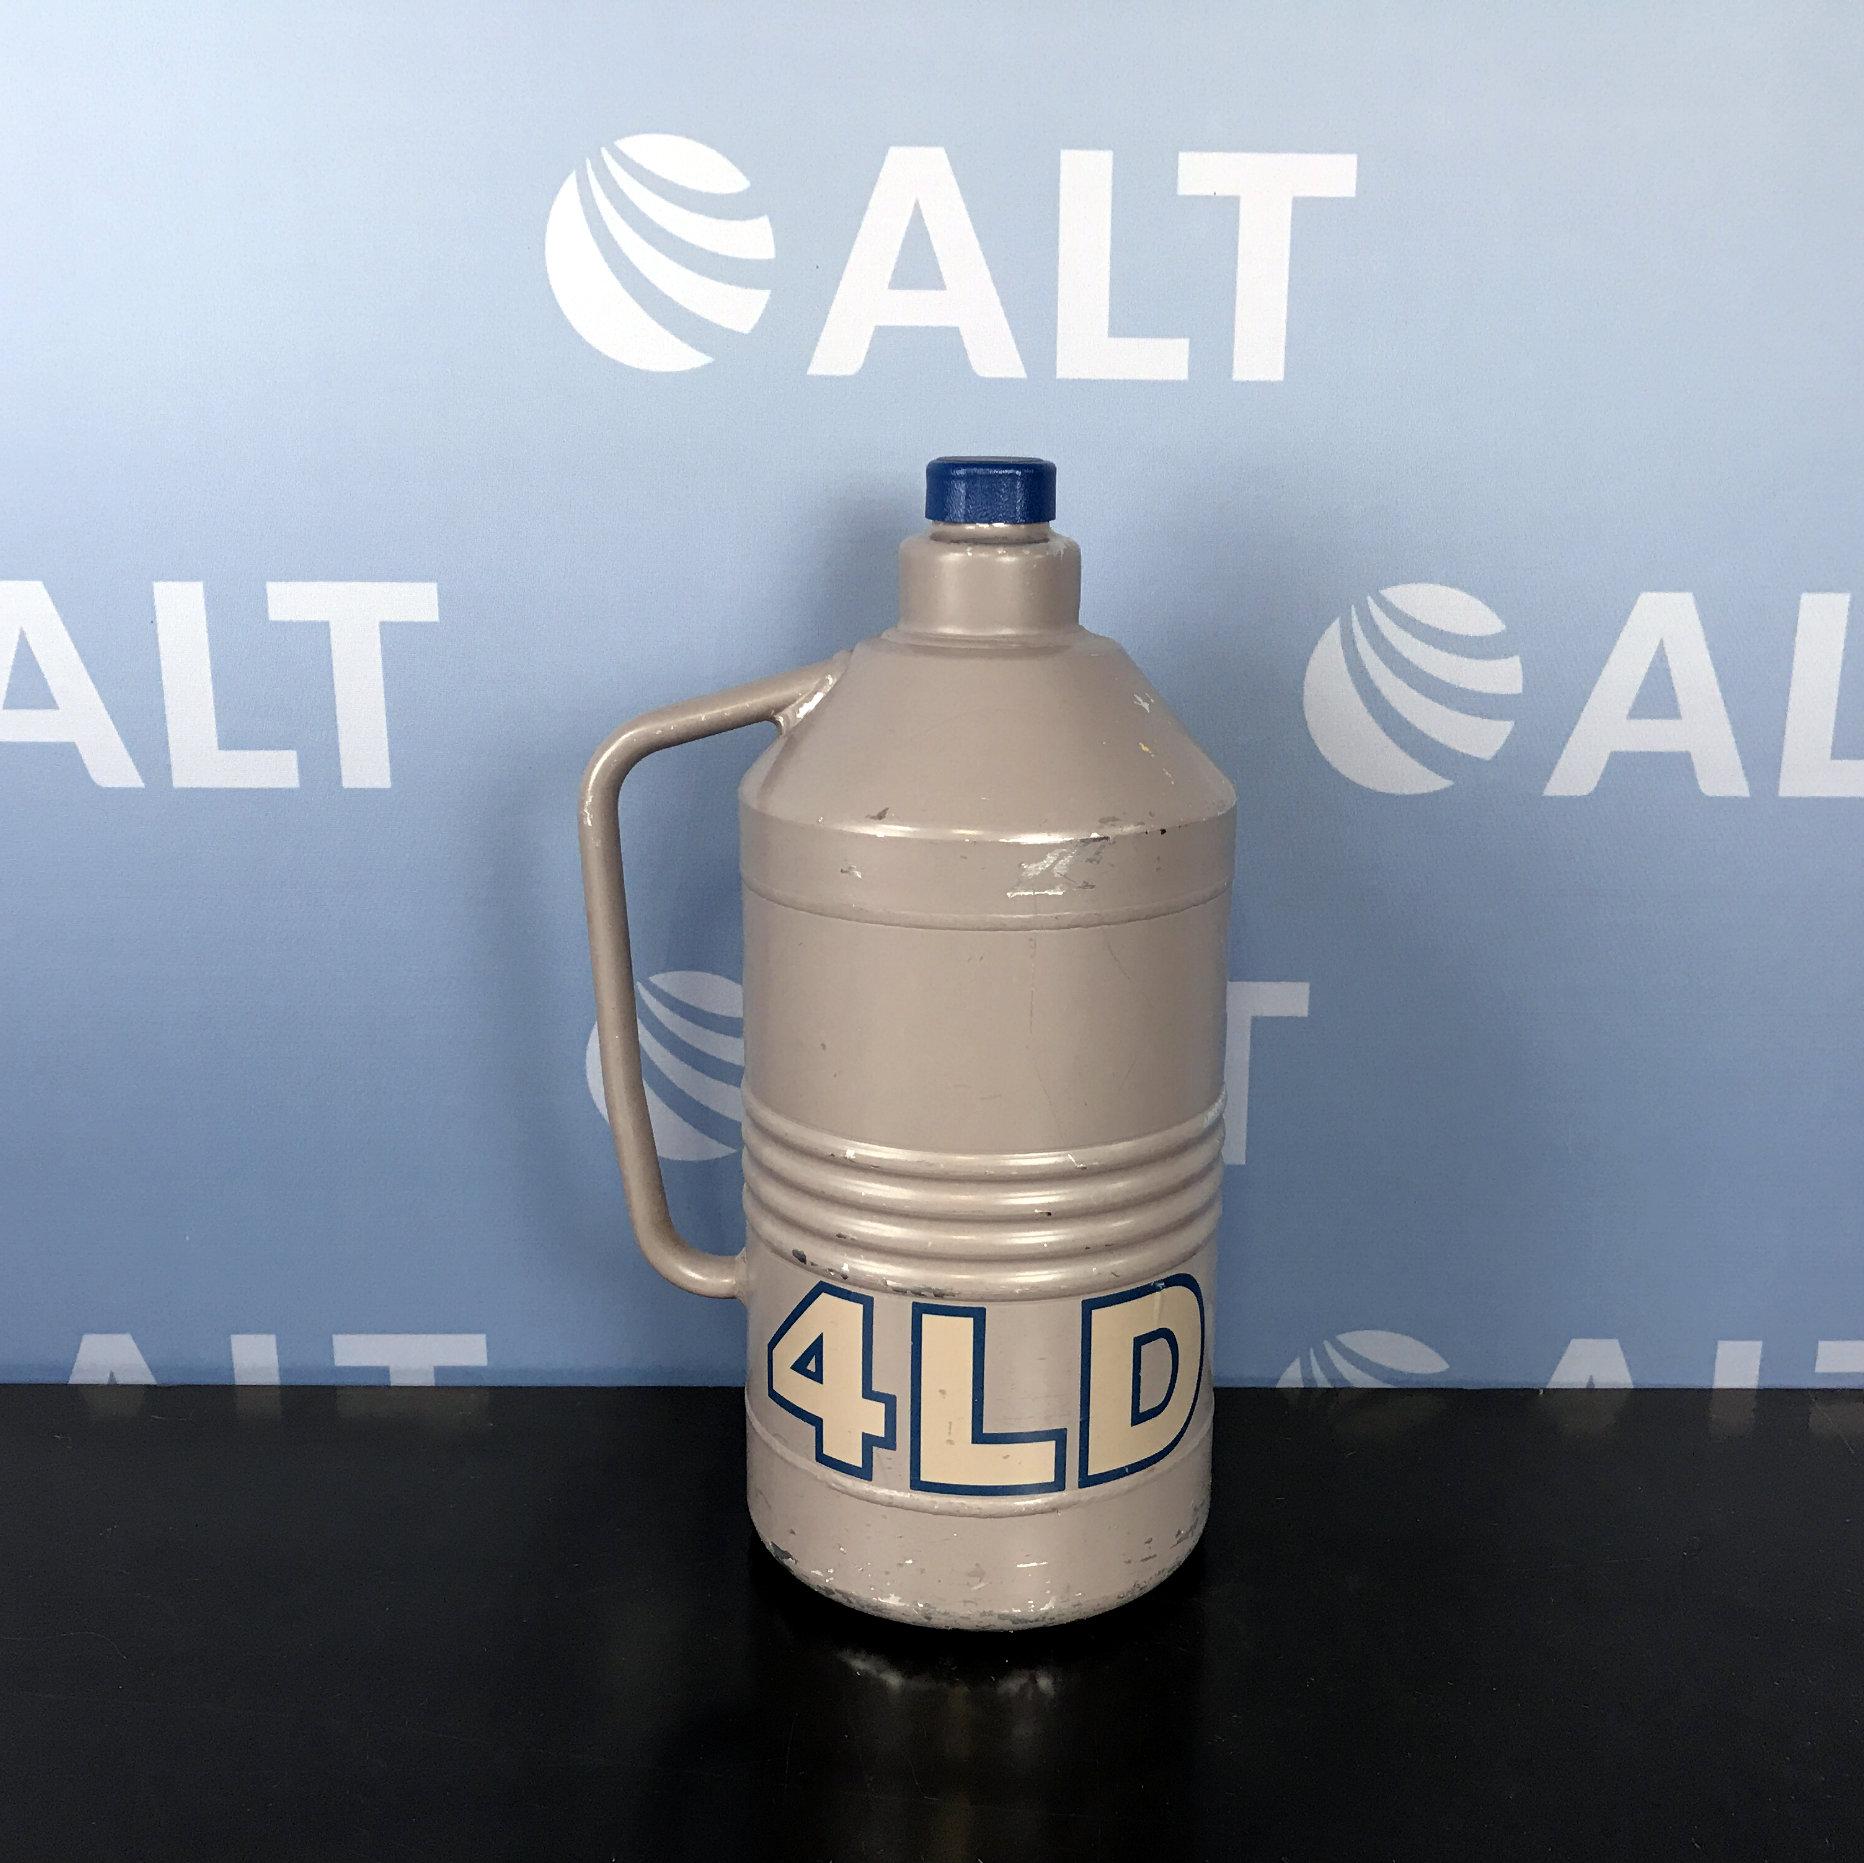 Taylor Wharton  4LD Liquid Nitrogen Dewar  Image